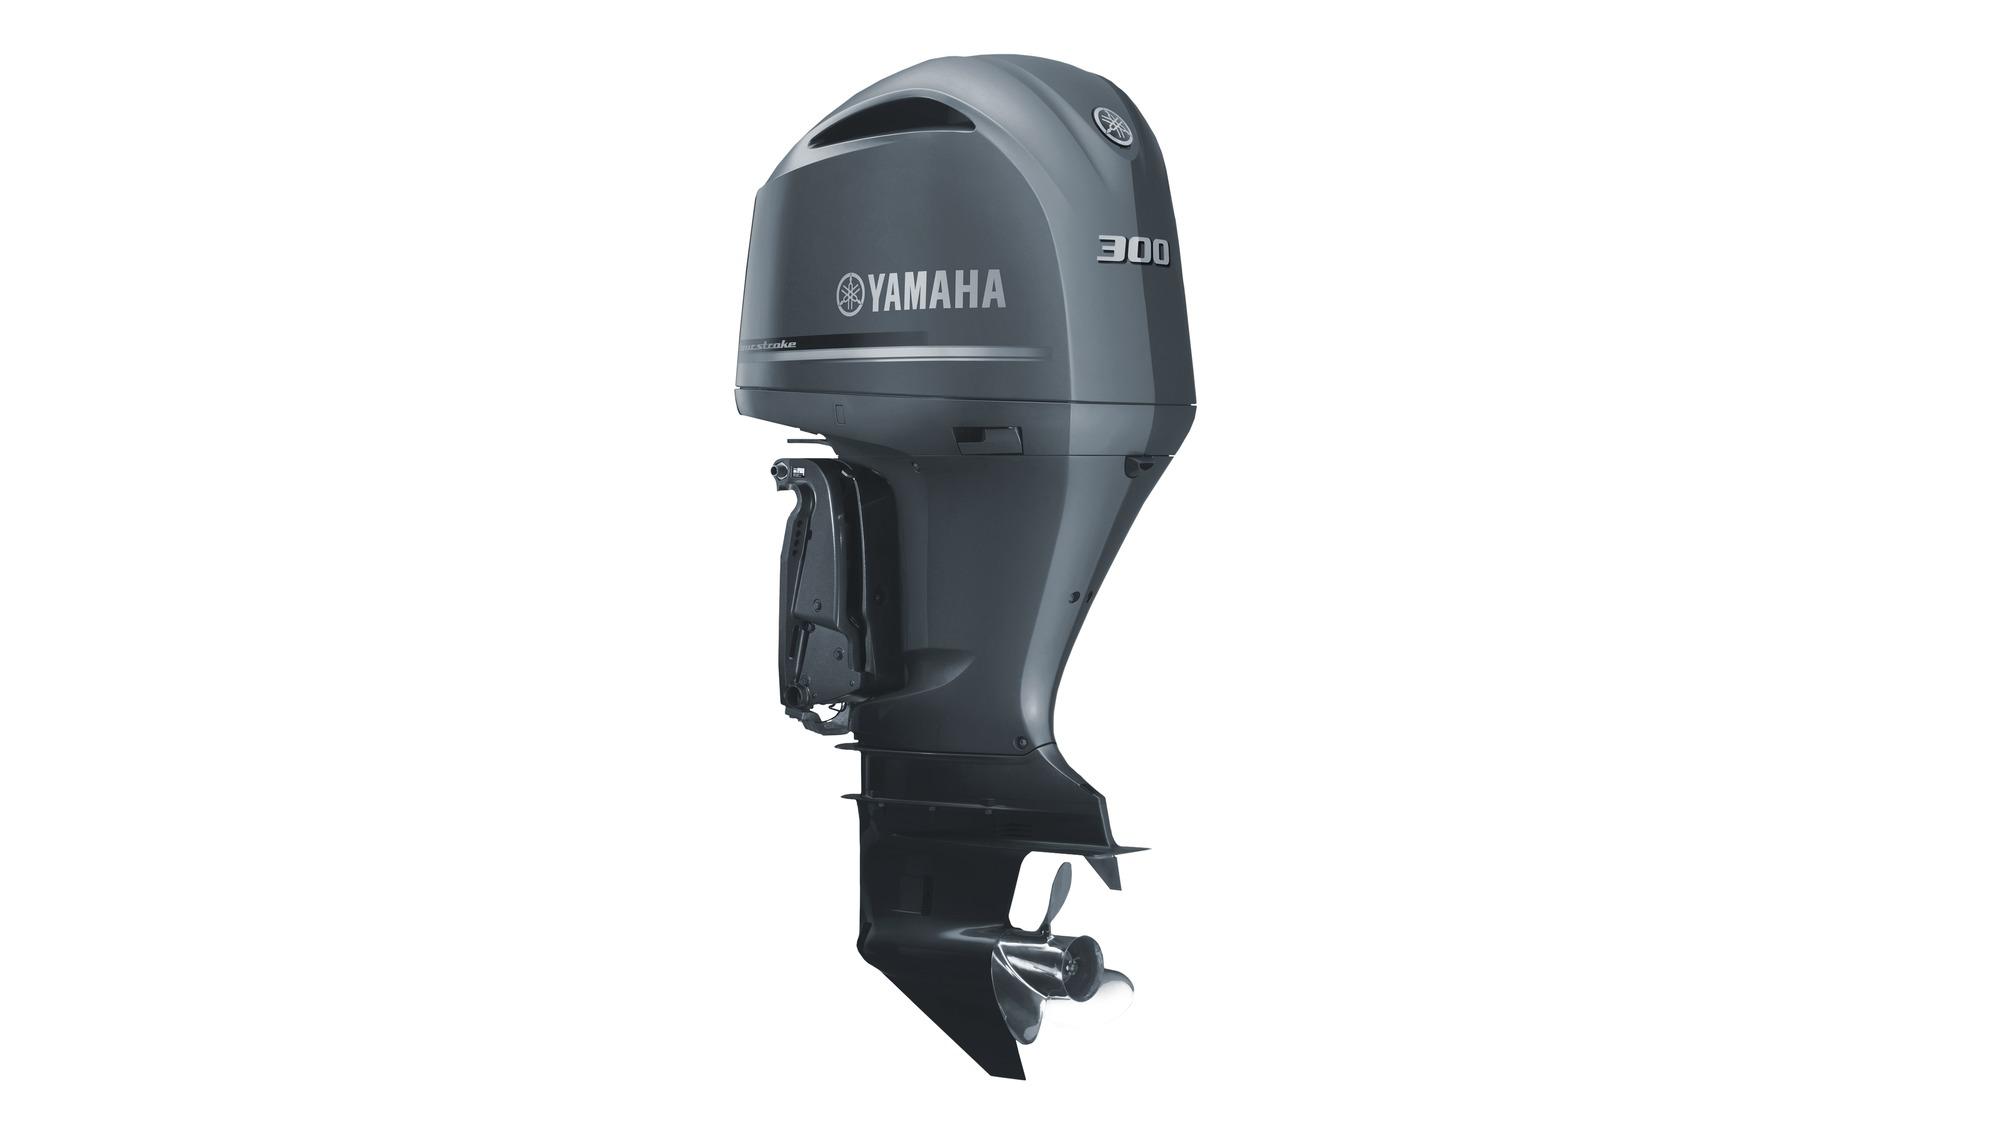 2015-Yamaha-F225-F250-F300-EU-NA-Studio-002-1.jpg